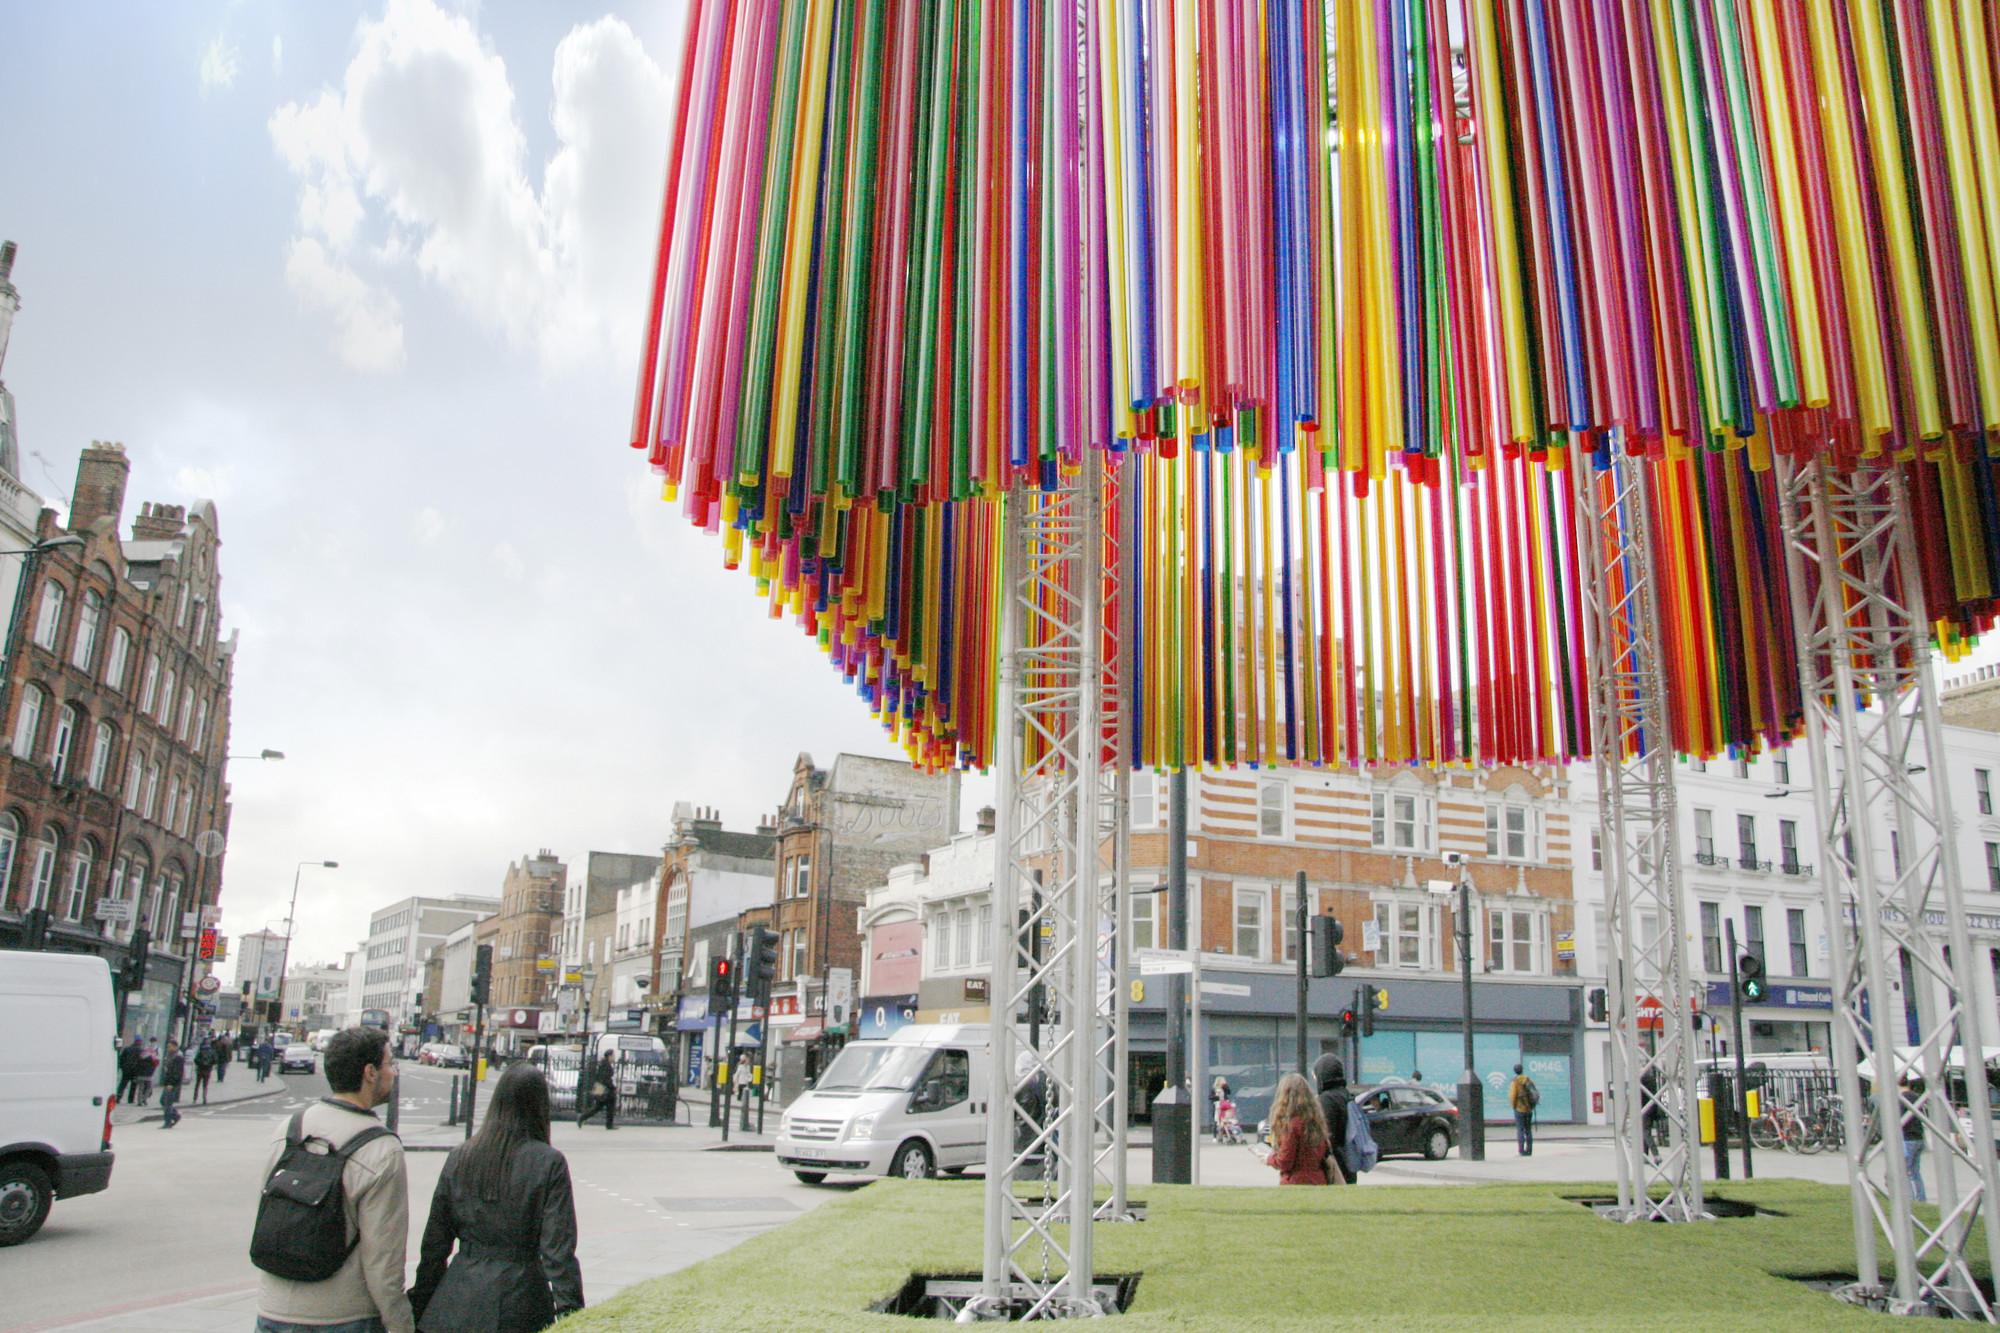 Architectural Design Event In London